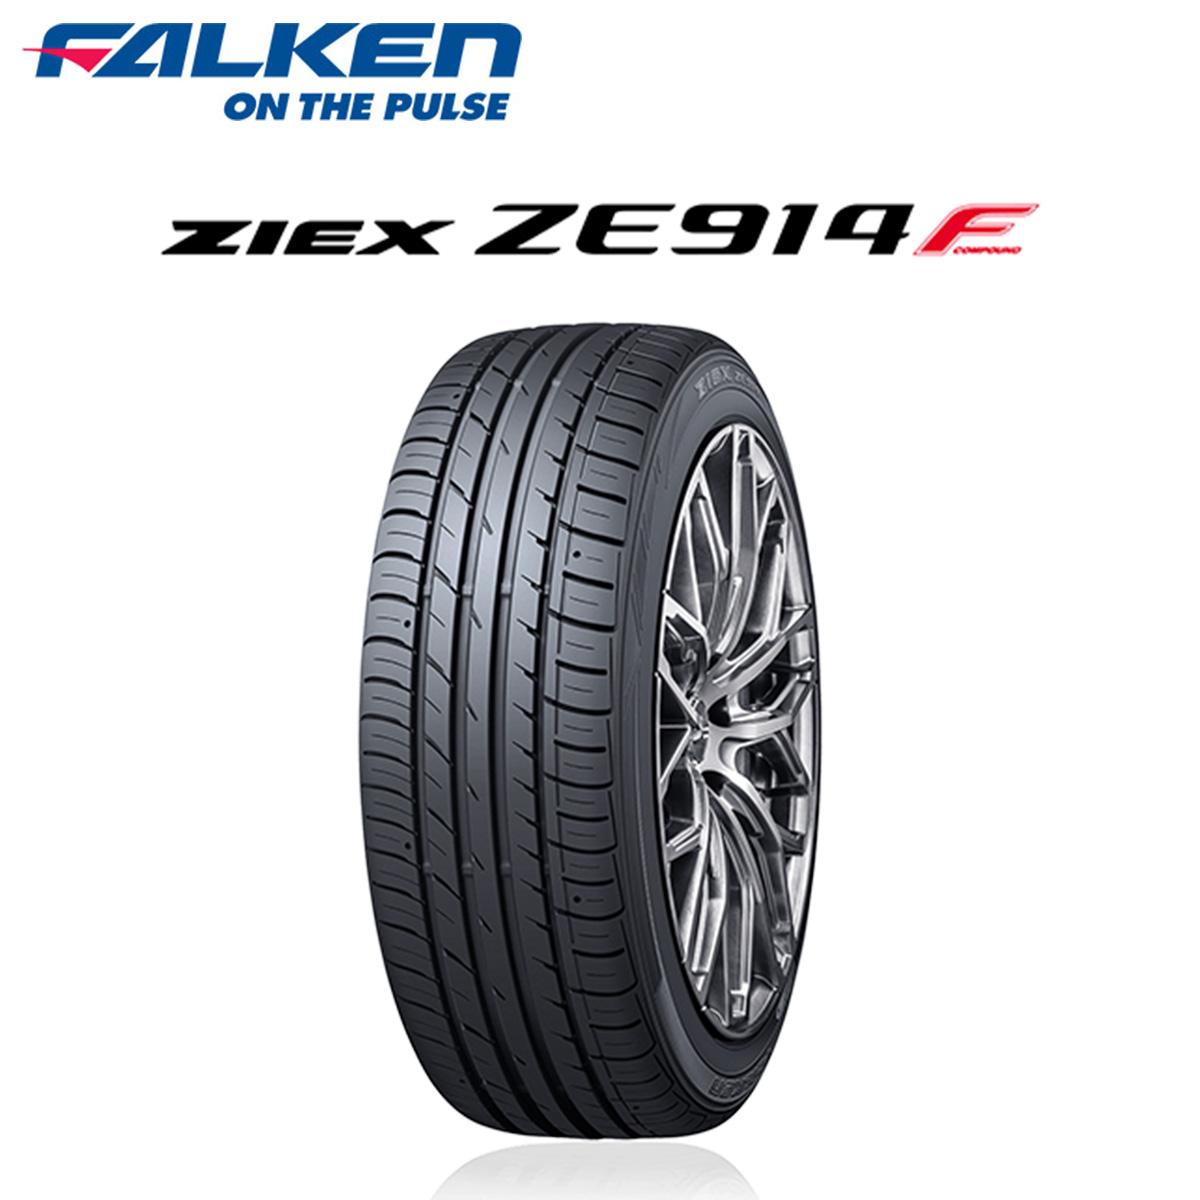 FALKEN ファルケン 低燃費 サマータイヤ 4本 セット 15インチ 195/50R15 ZIEX ZE914F ジークス